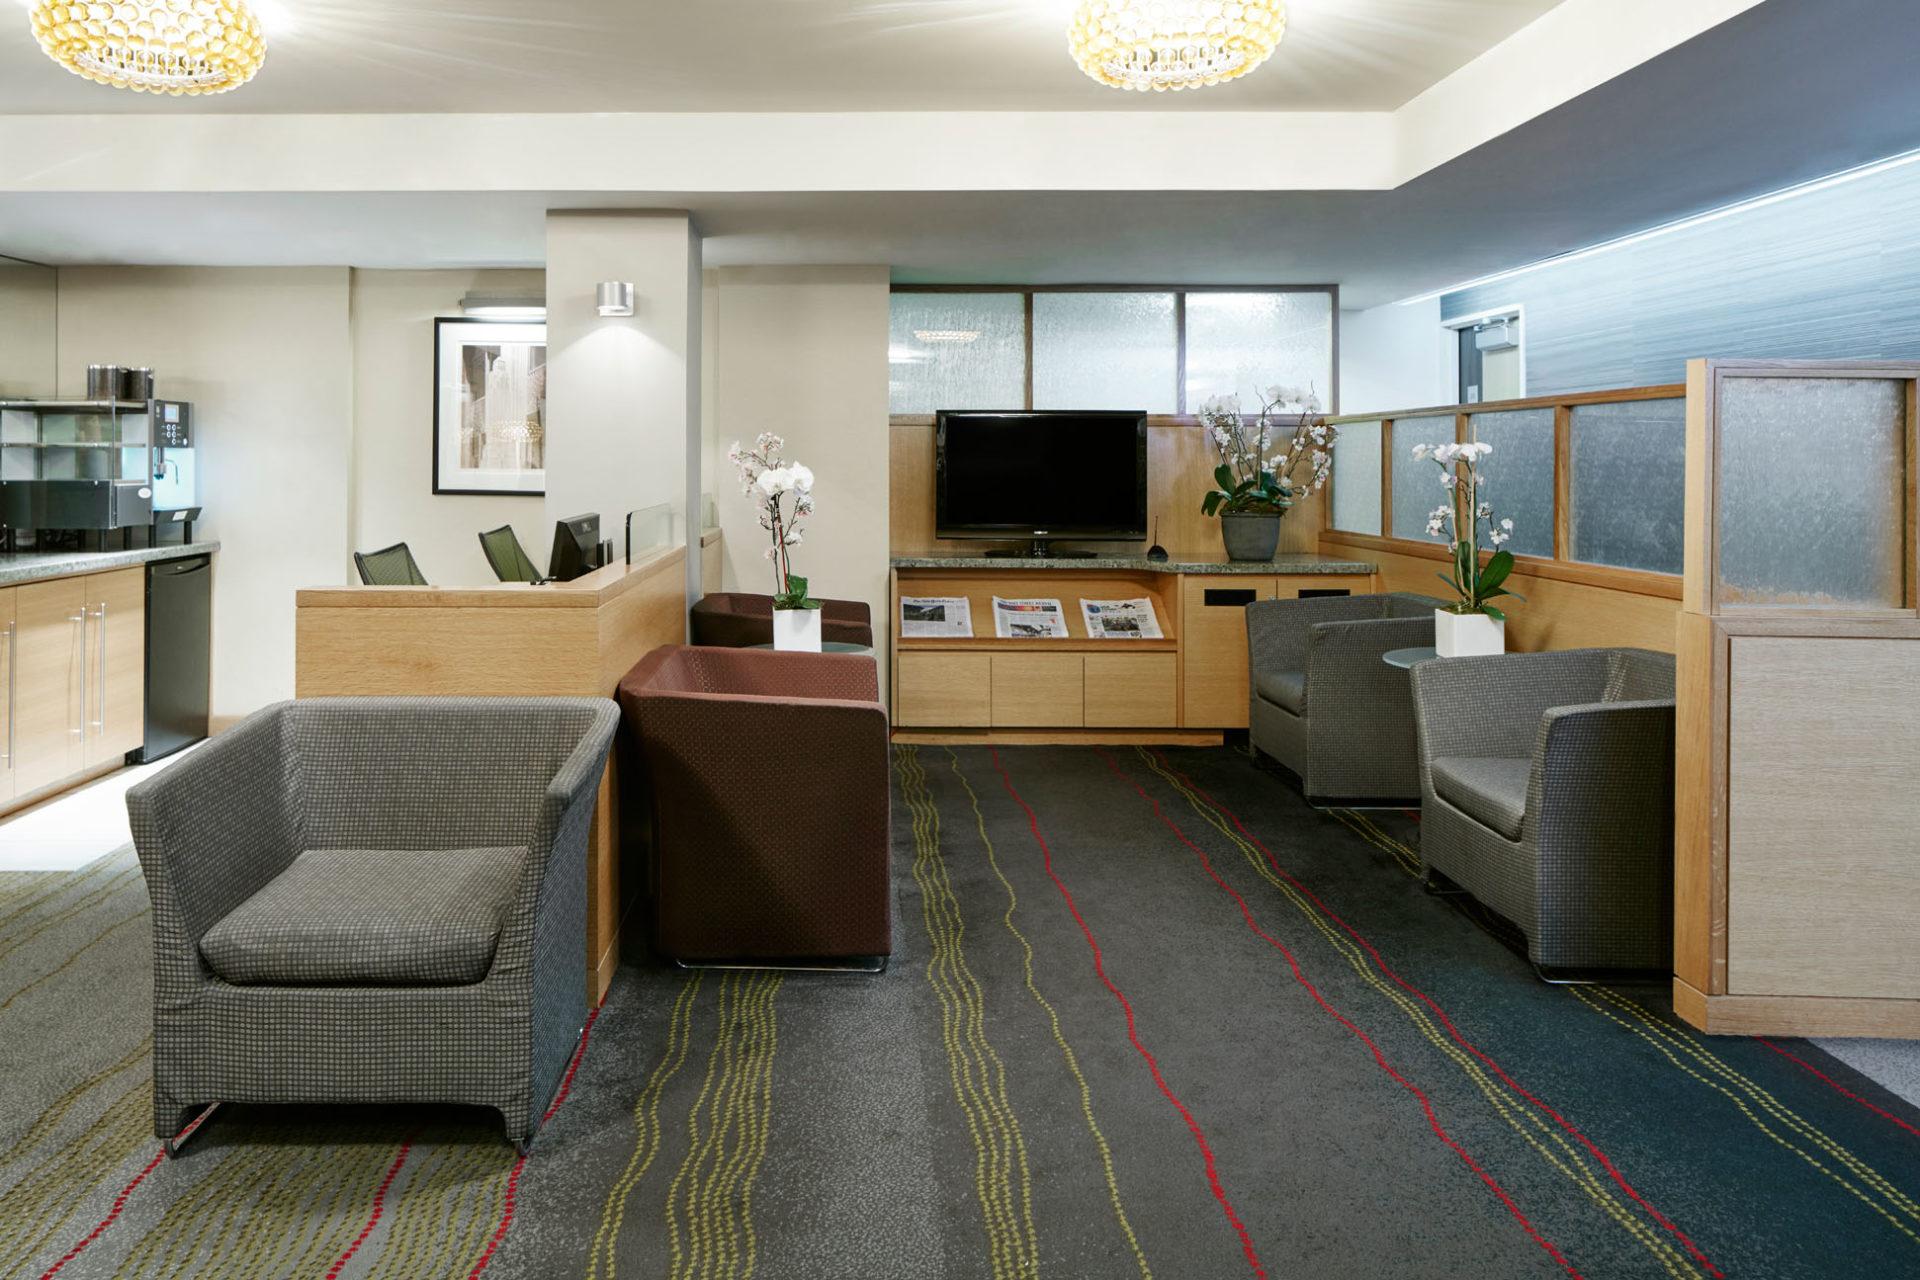 https://www.hotelsbyday.com/_data/default-hotel_image/1/7710/lounge-cq-jewel-3377-1920x1280.jpg